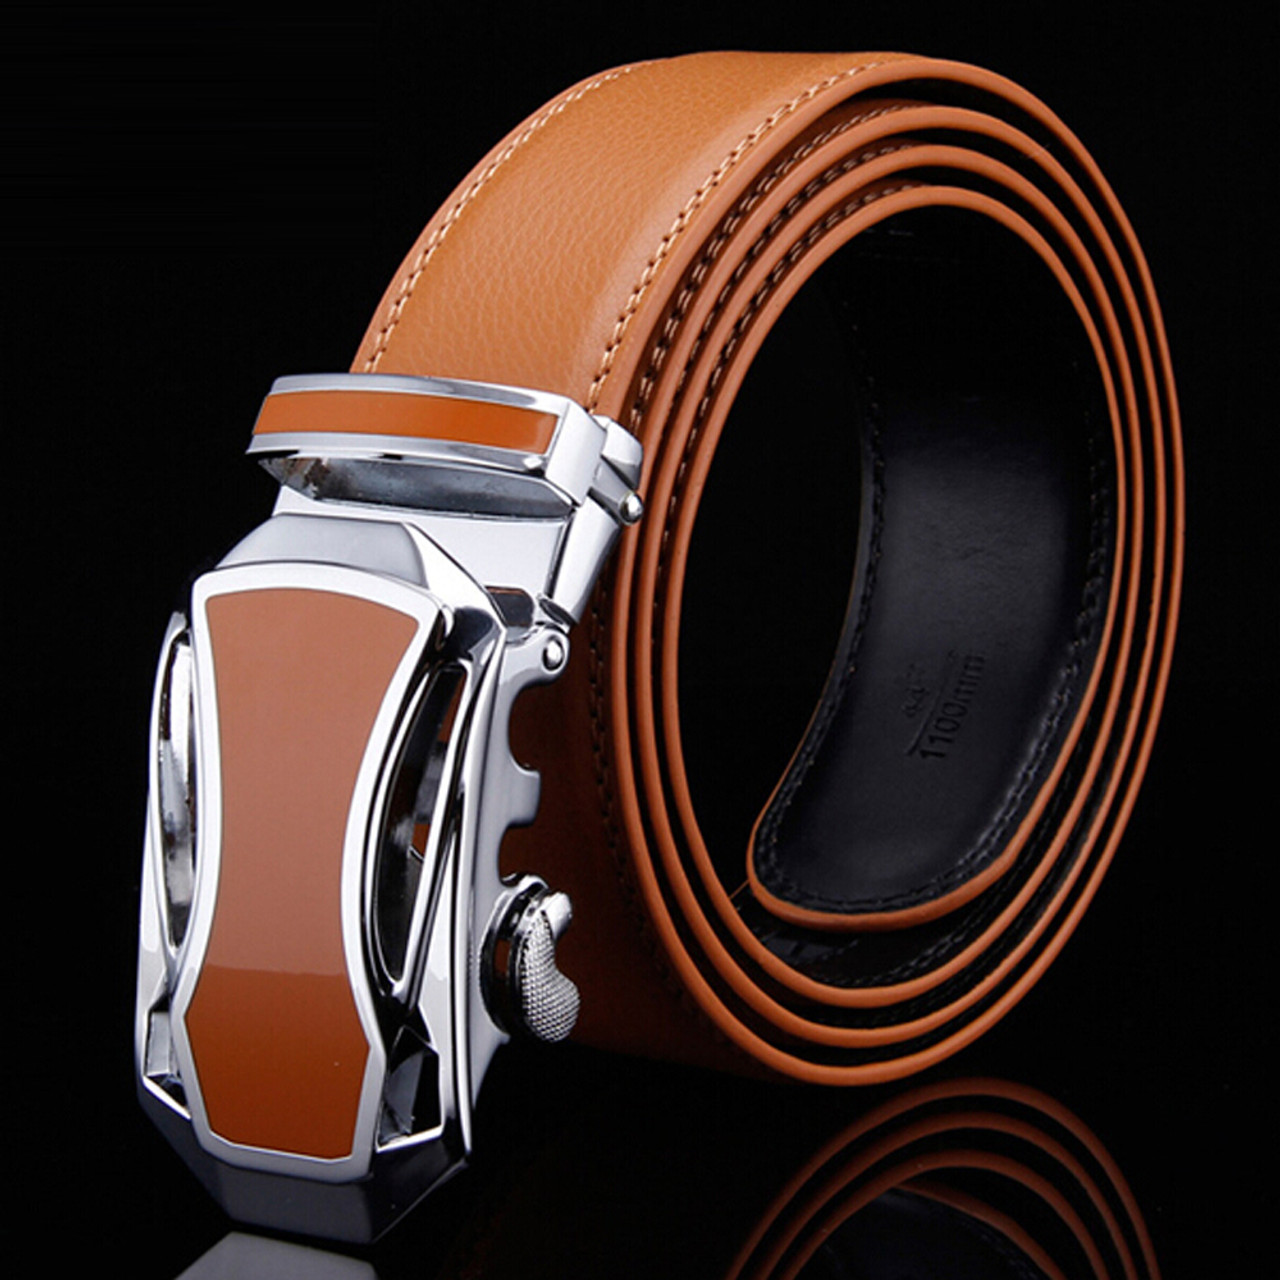 7a053a0d4720 New arrival fashion men belt wholesale price male brand luxury belts jpg  1000x1000 Wholesale belt buckles